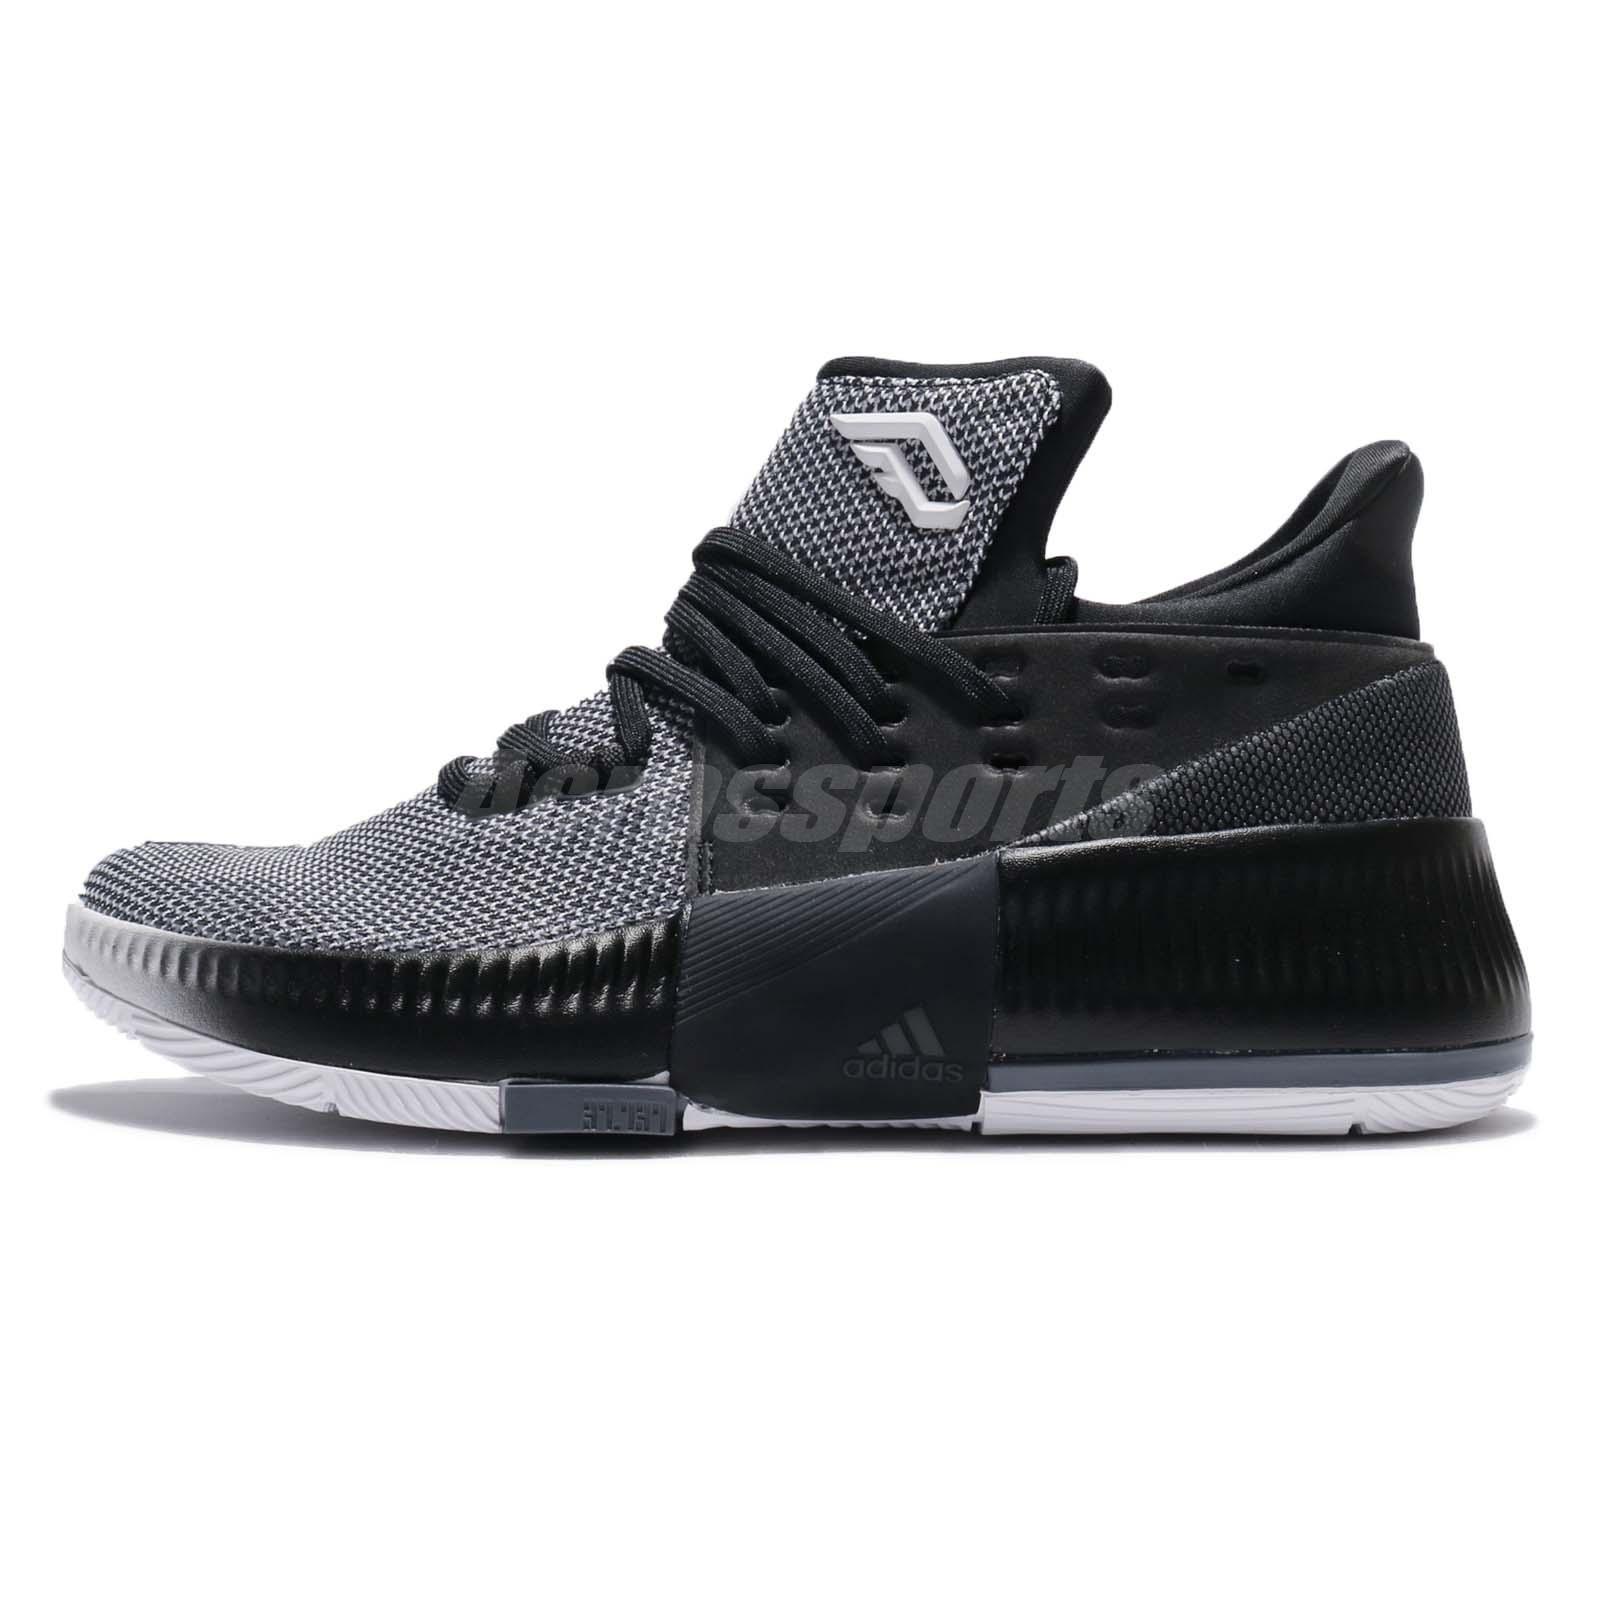 adidas basketball shoes damian lillard. adidas dame 3 j damian lillard black white kids boys basketball shoes cg4228 e